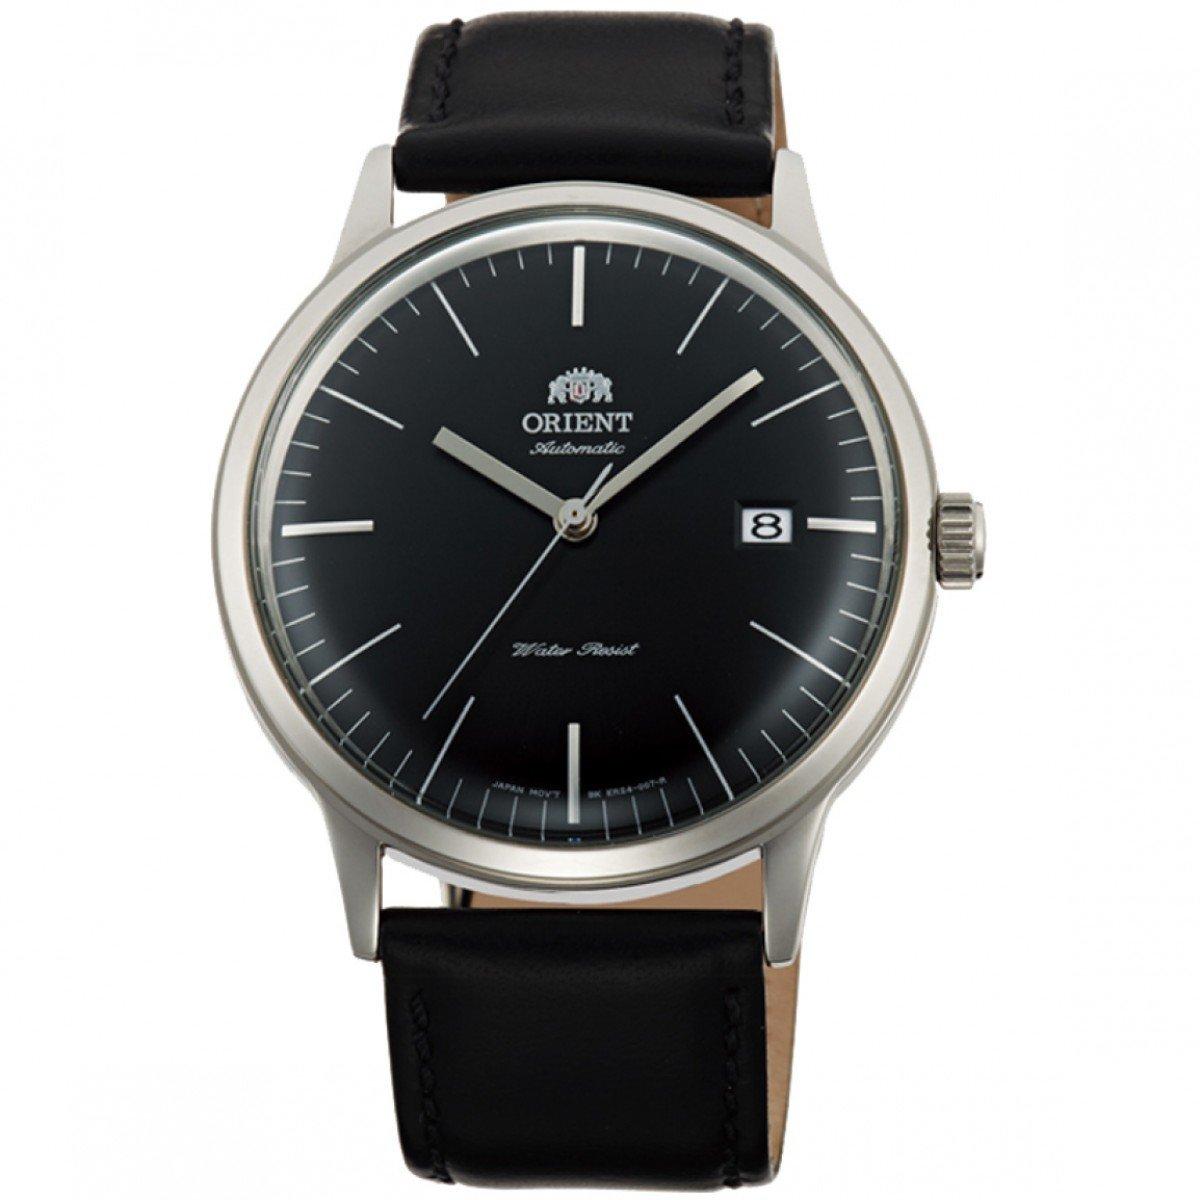 Reloj Orient Bambino Classic automático  Fac0000db